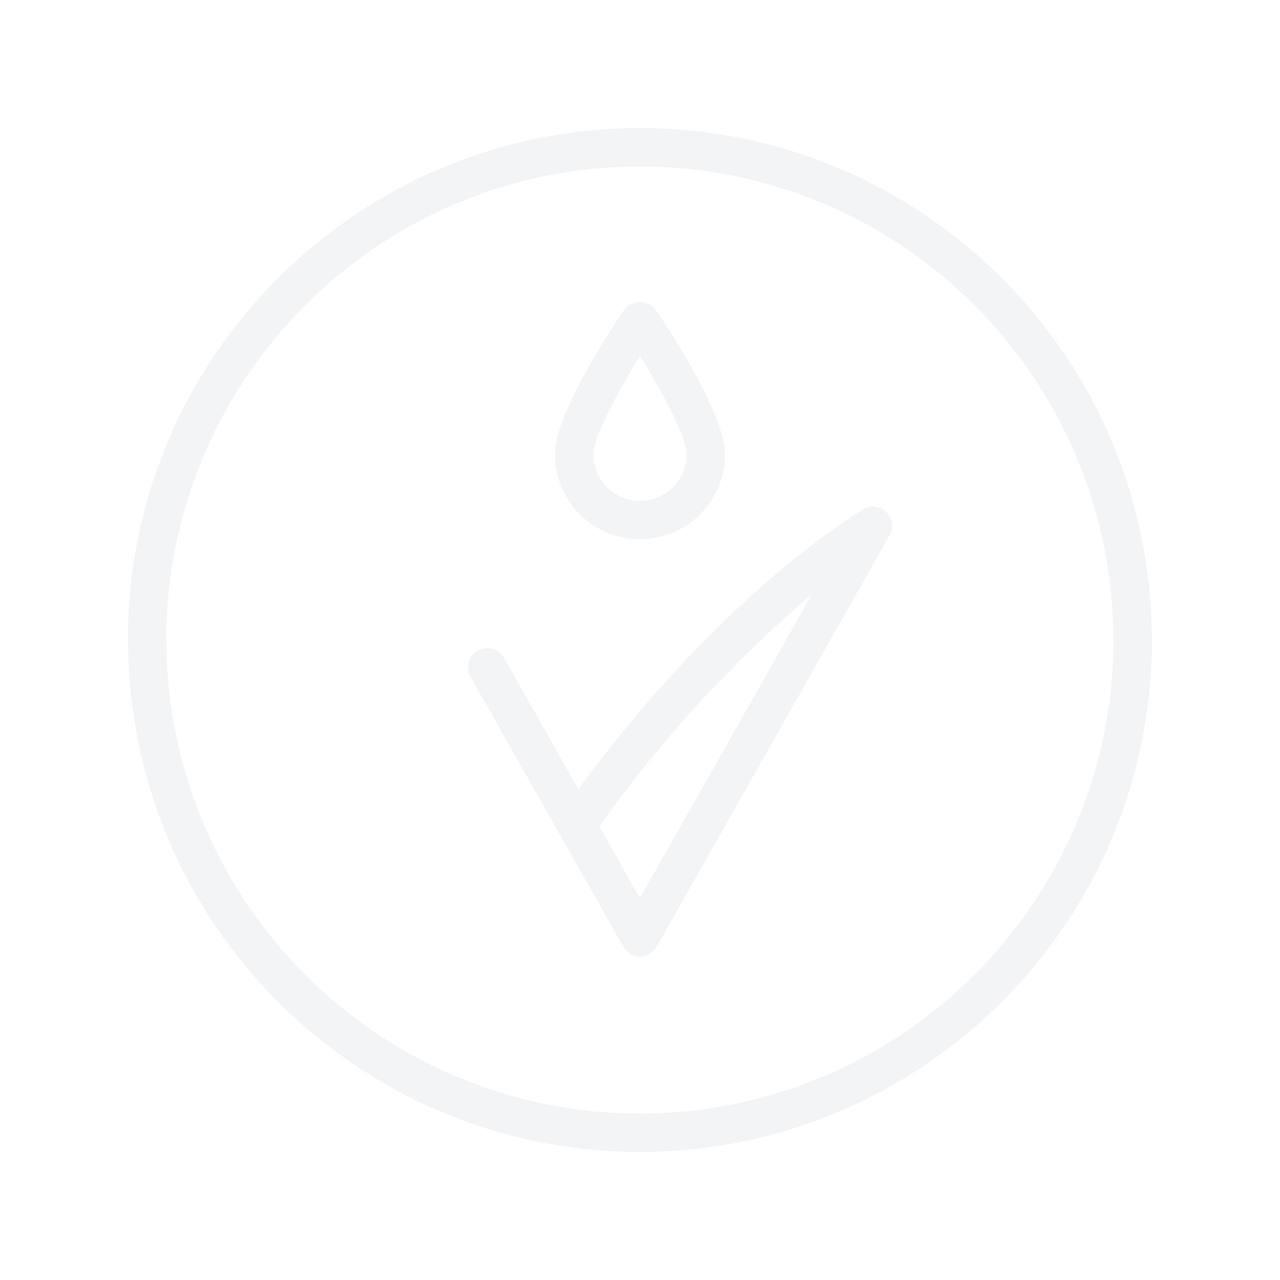 MINIGOLD Lovemark Star Lavender Комплект